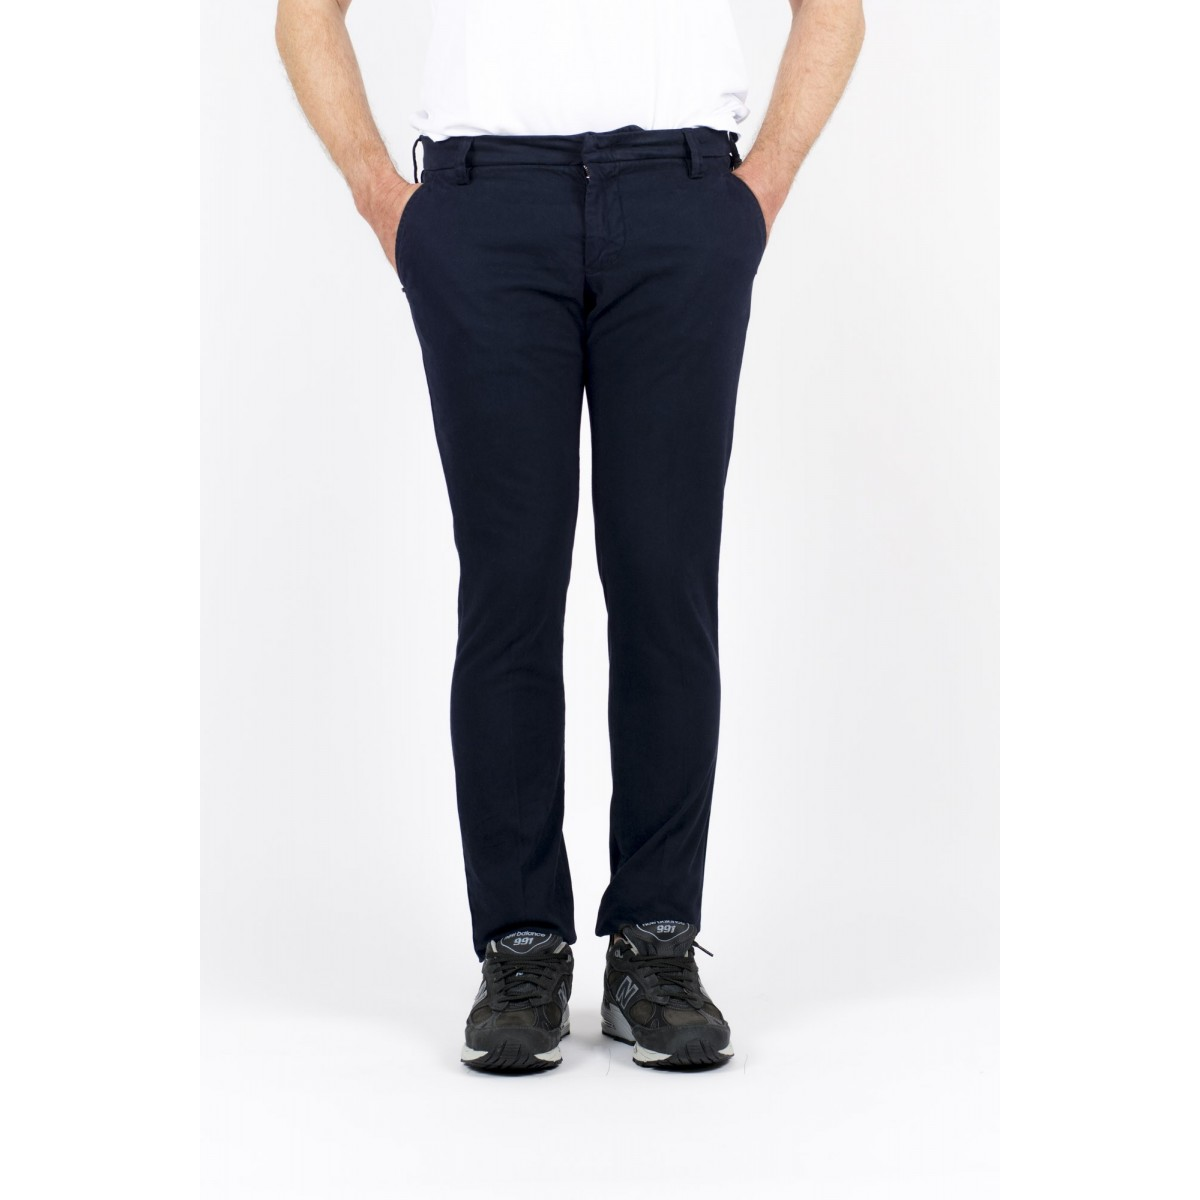 Pantalone uomo Entre amis - Pantalone tasca america slim con fondo 16cm 401- Blu